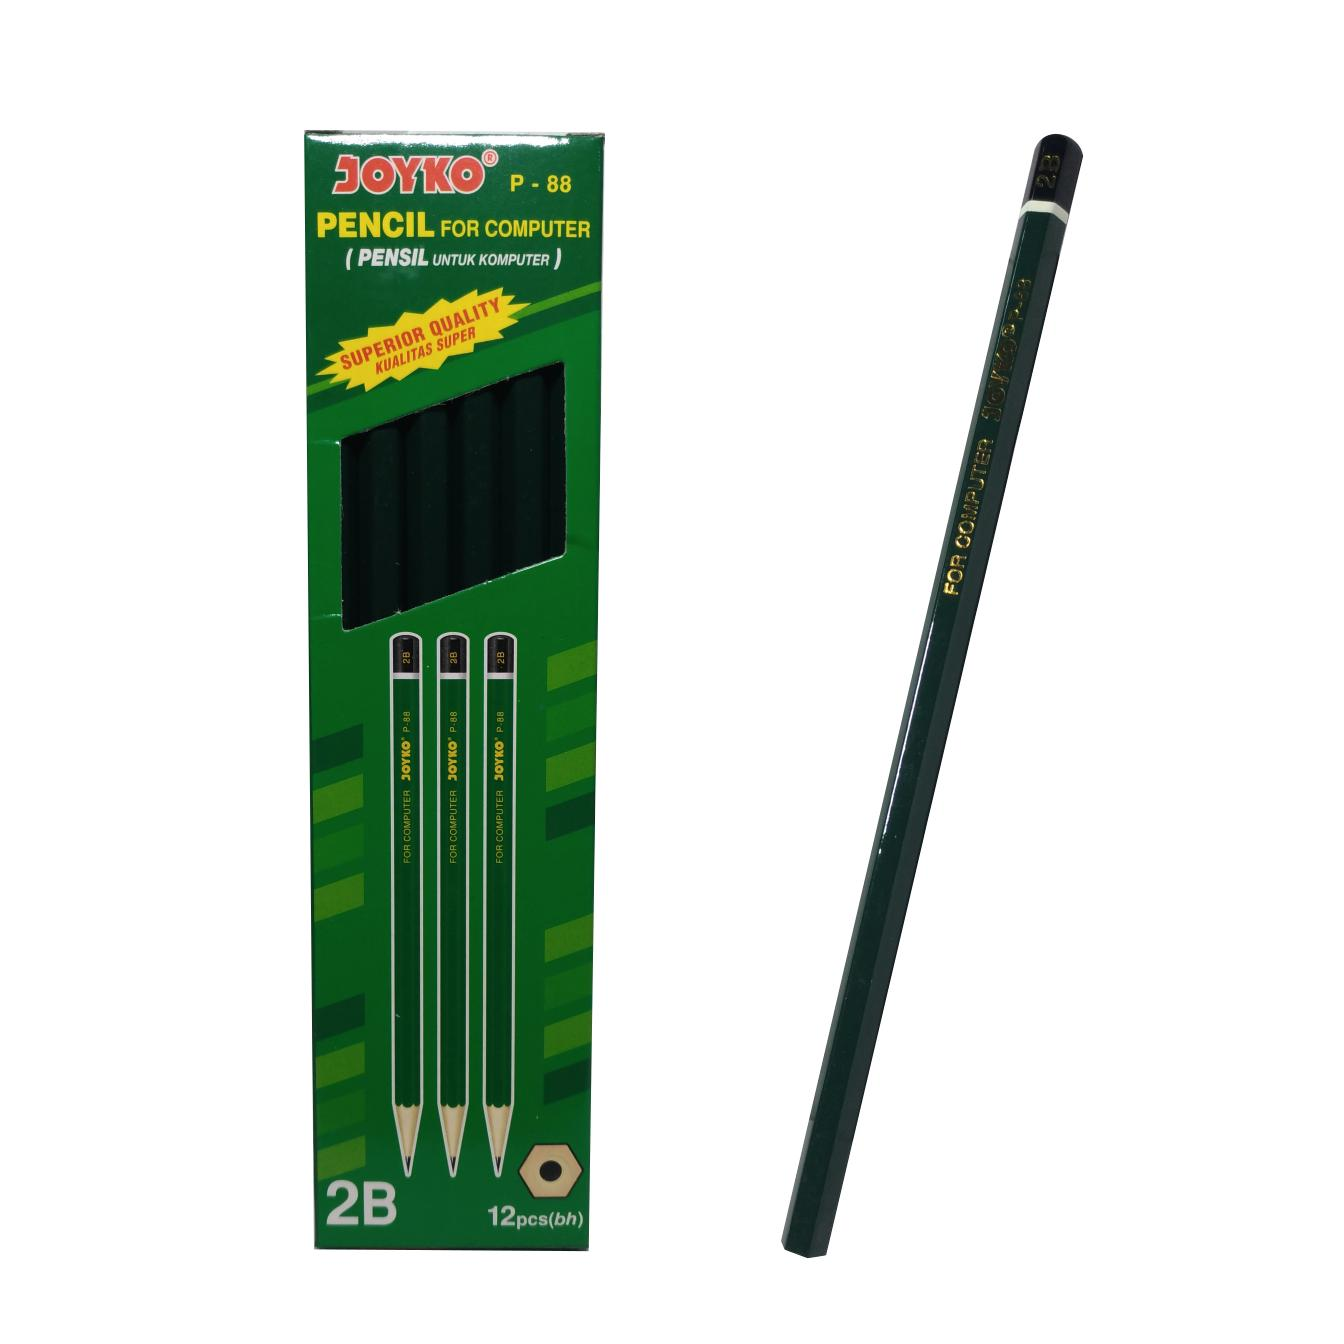 Joyko Pencil For Computer P-88 2B [1 Pak/12 Pcs]